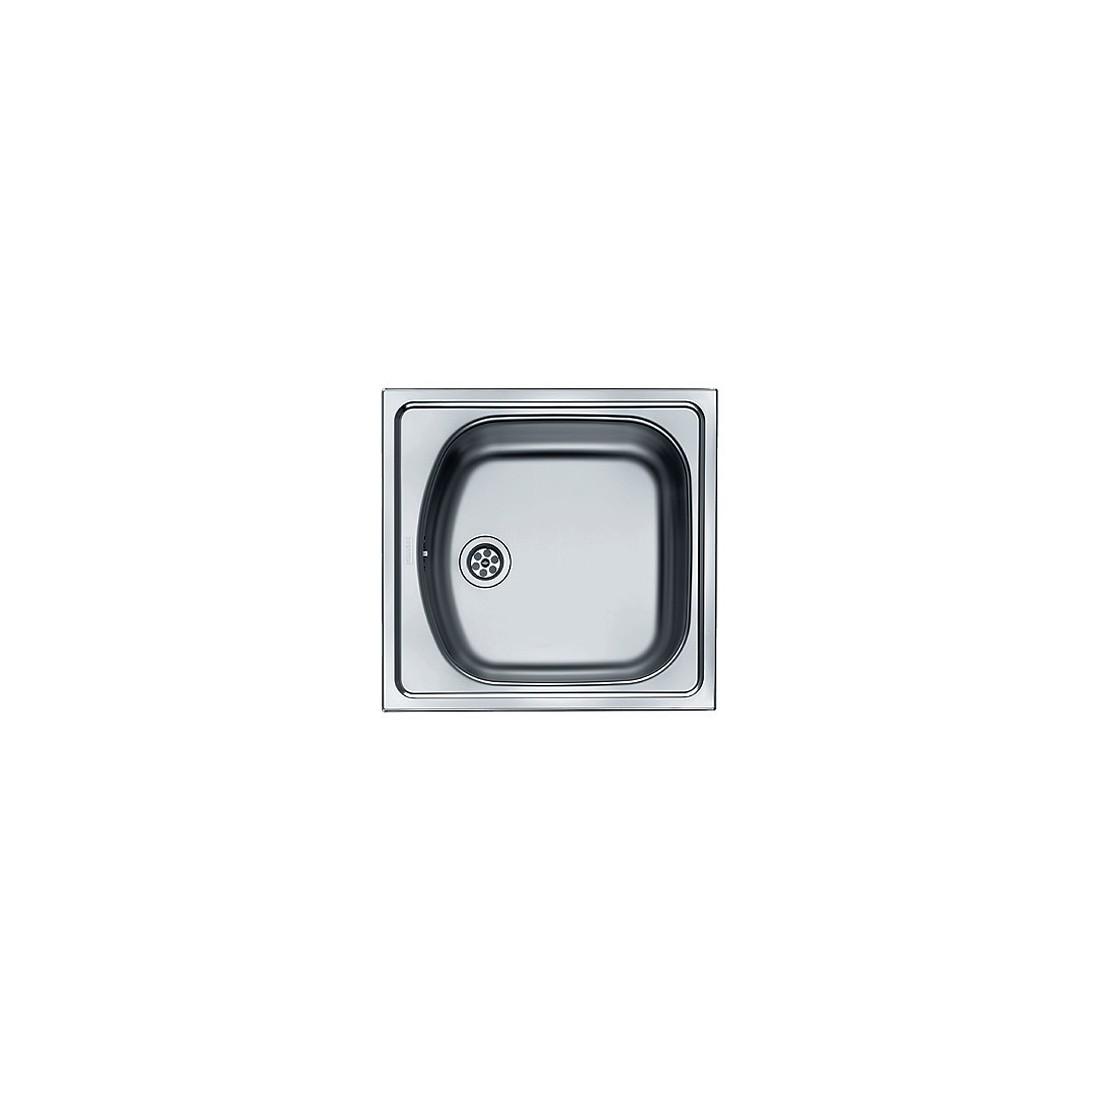 Plautuvė  ETN 610, 455x435 mm, nerūdijantis plienas